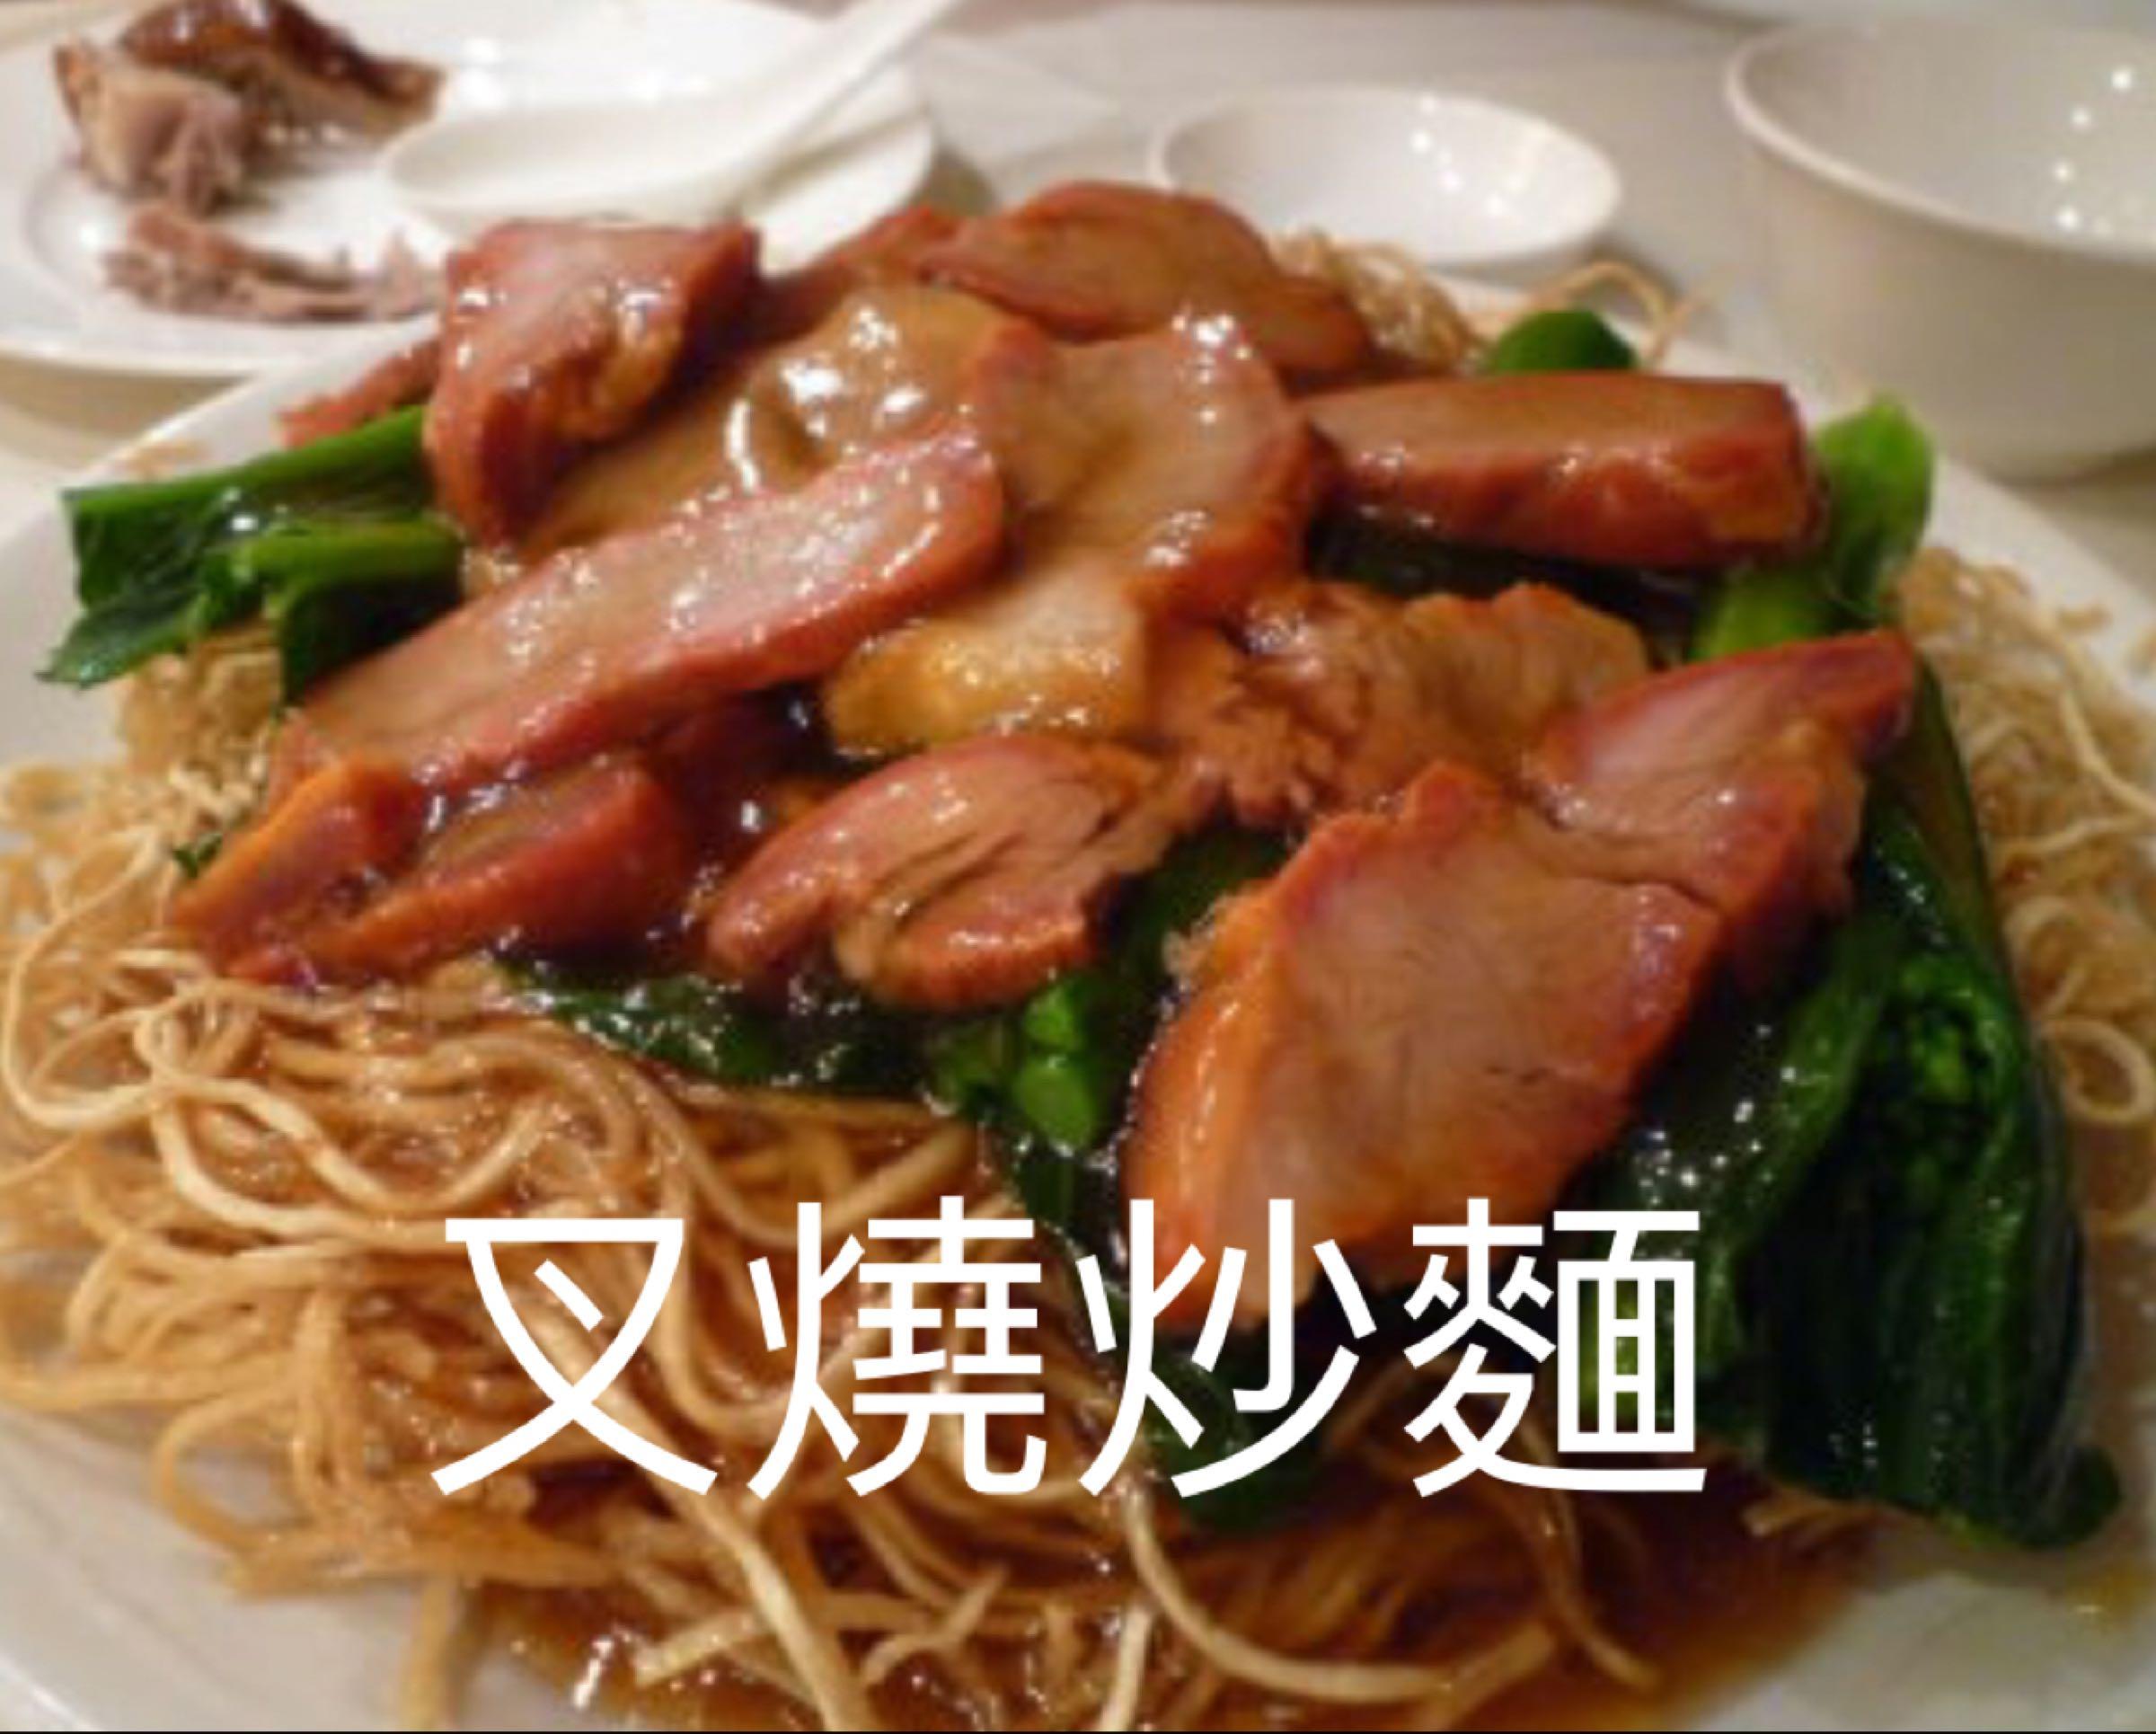 叉燒炒麵 BBQ Pork Fried Noodle